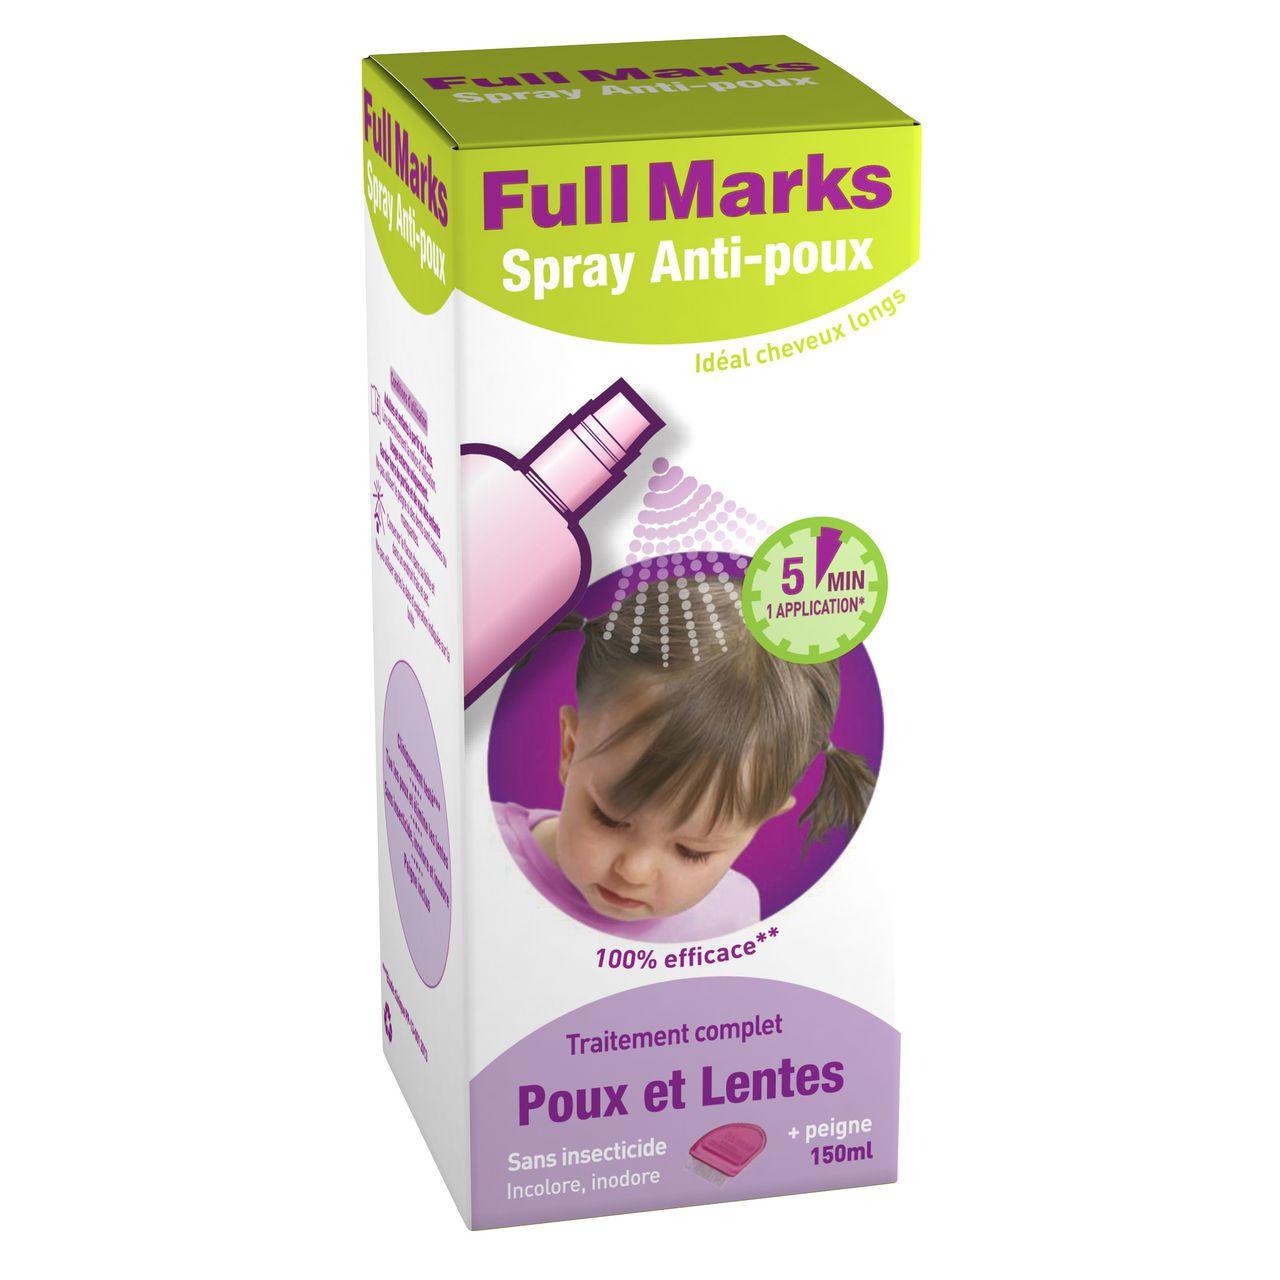 Full Marks lotion anti-poux